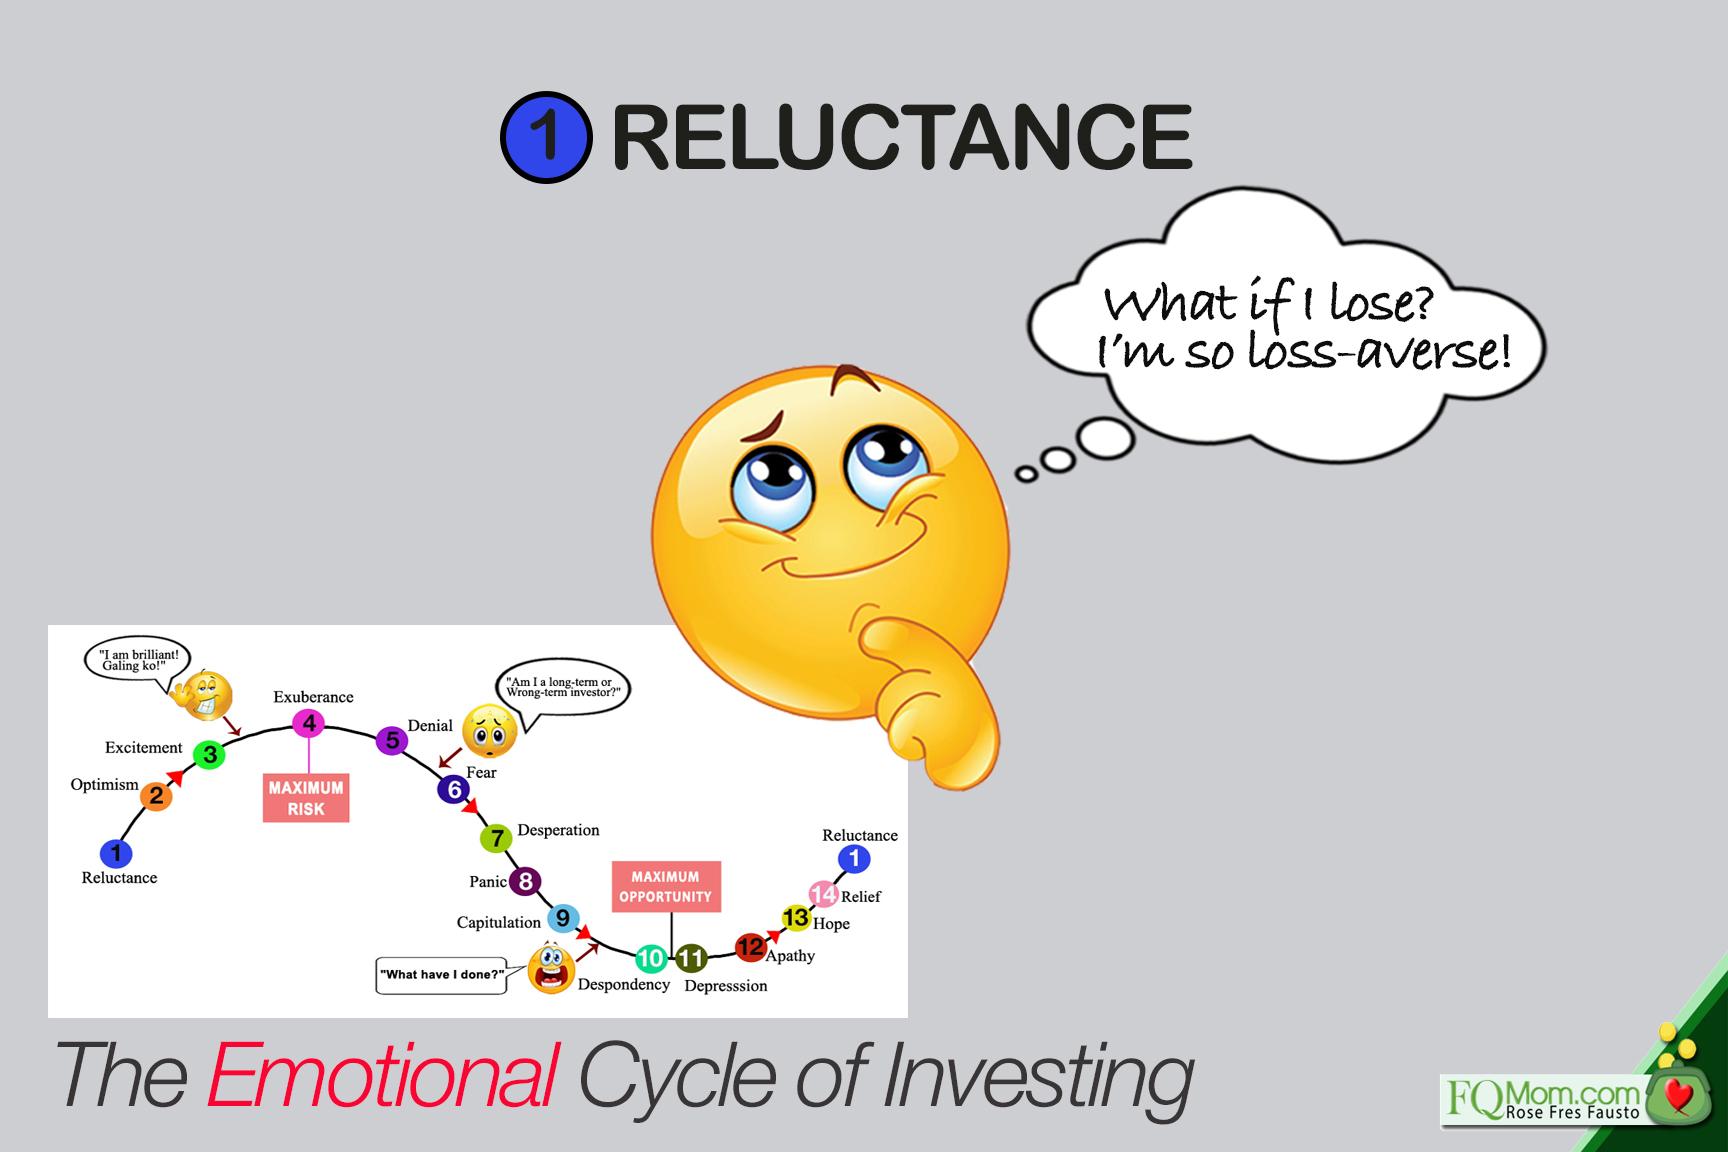 1-reluctance-d